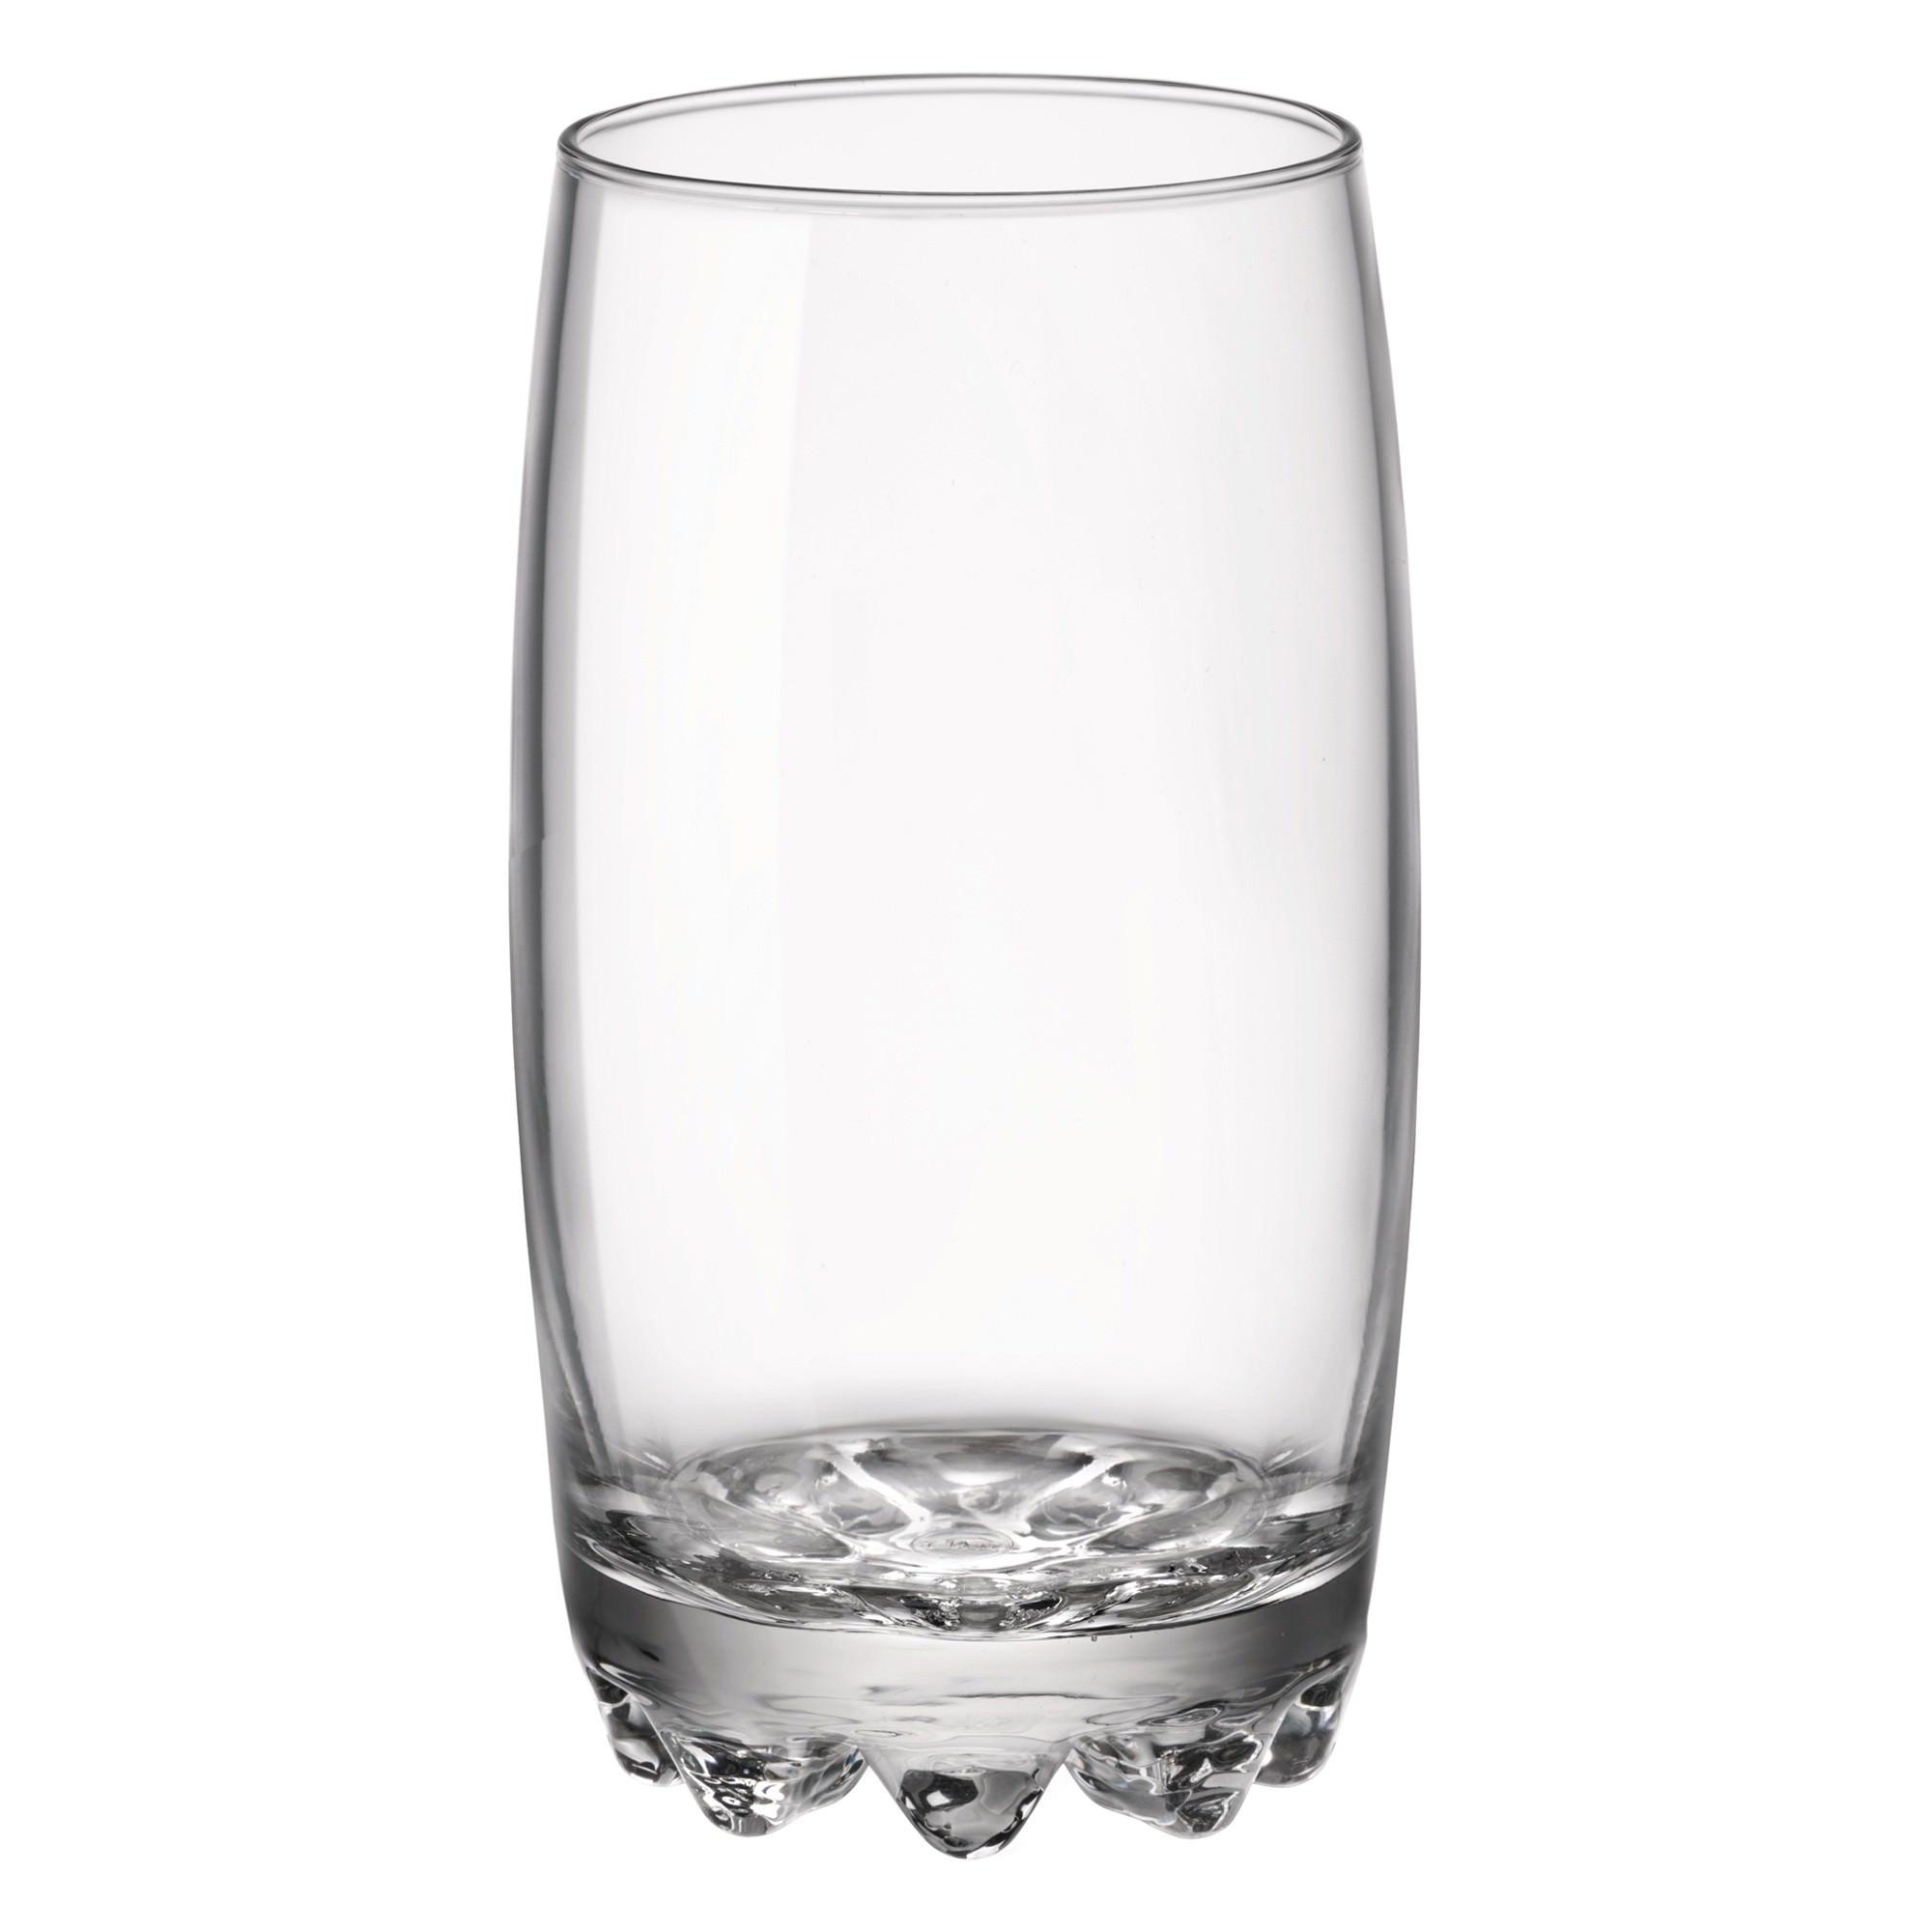 Bormioli Rocco Galassia High Ball Glasses, Set of 6